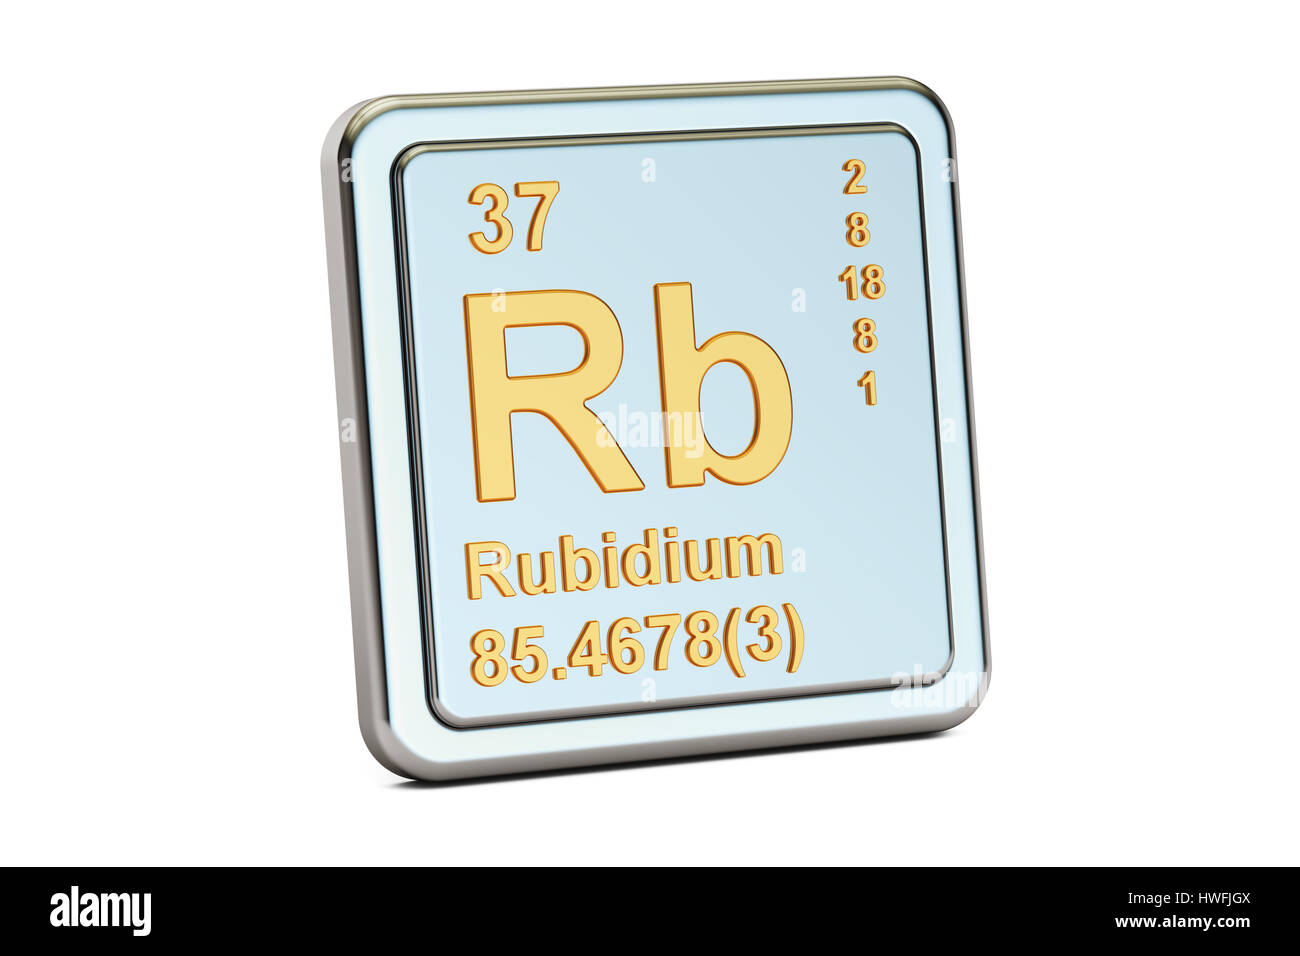 Rubidium rb chemical element sign 3d rendering isolated on white rubidium rb chemical element sign 3d rendering isolated on white background buycottarizona Choice Image